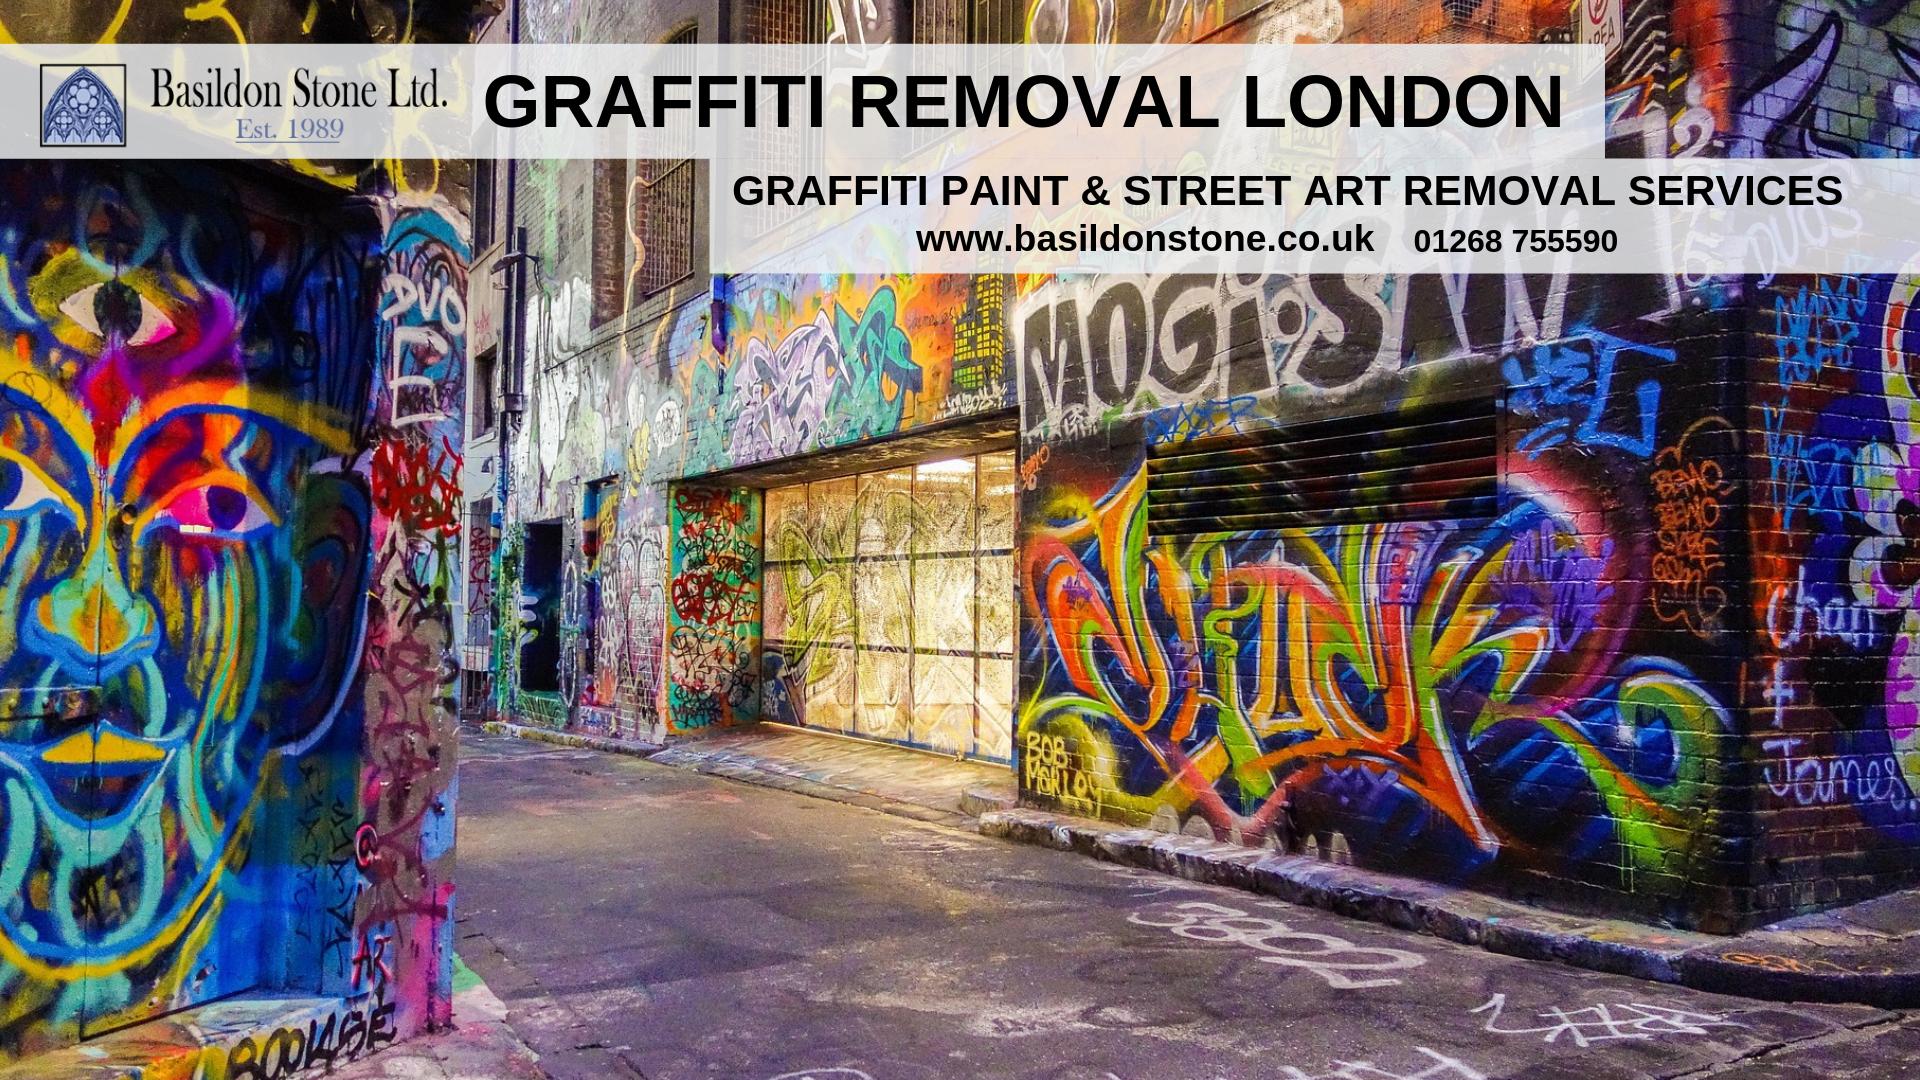 Basildon stone provides a professional and cost effective graffiti removal service